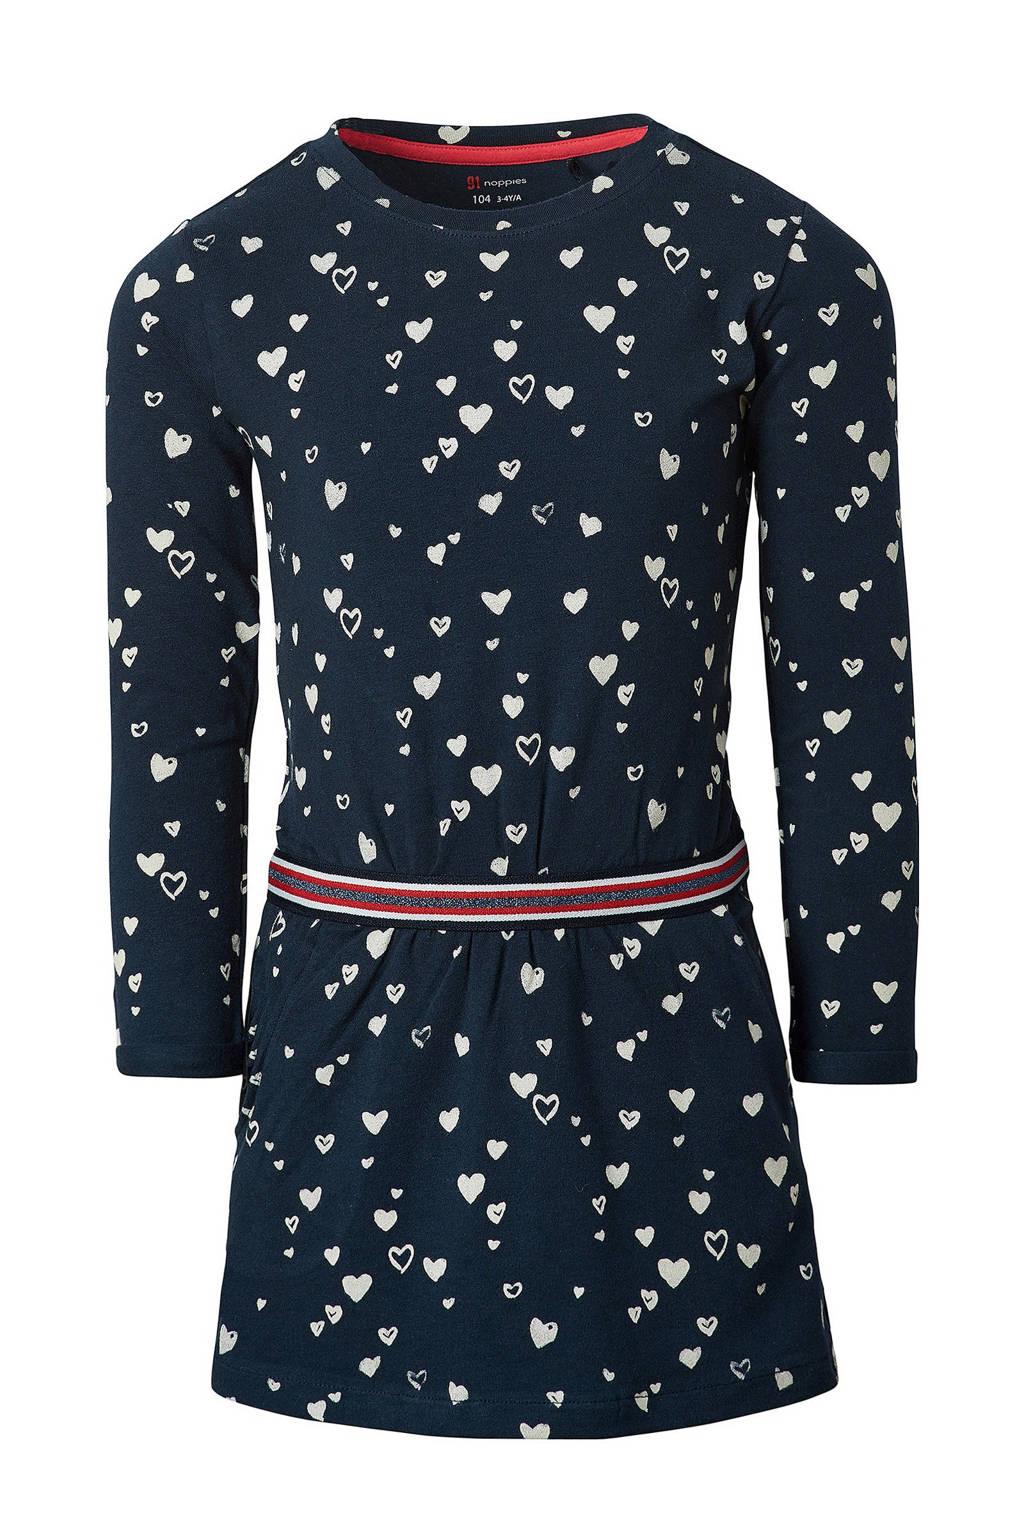 Noppies jurk Roux met all over print donkerblauw/wit, Donkerblauw/wit